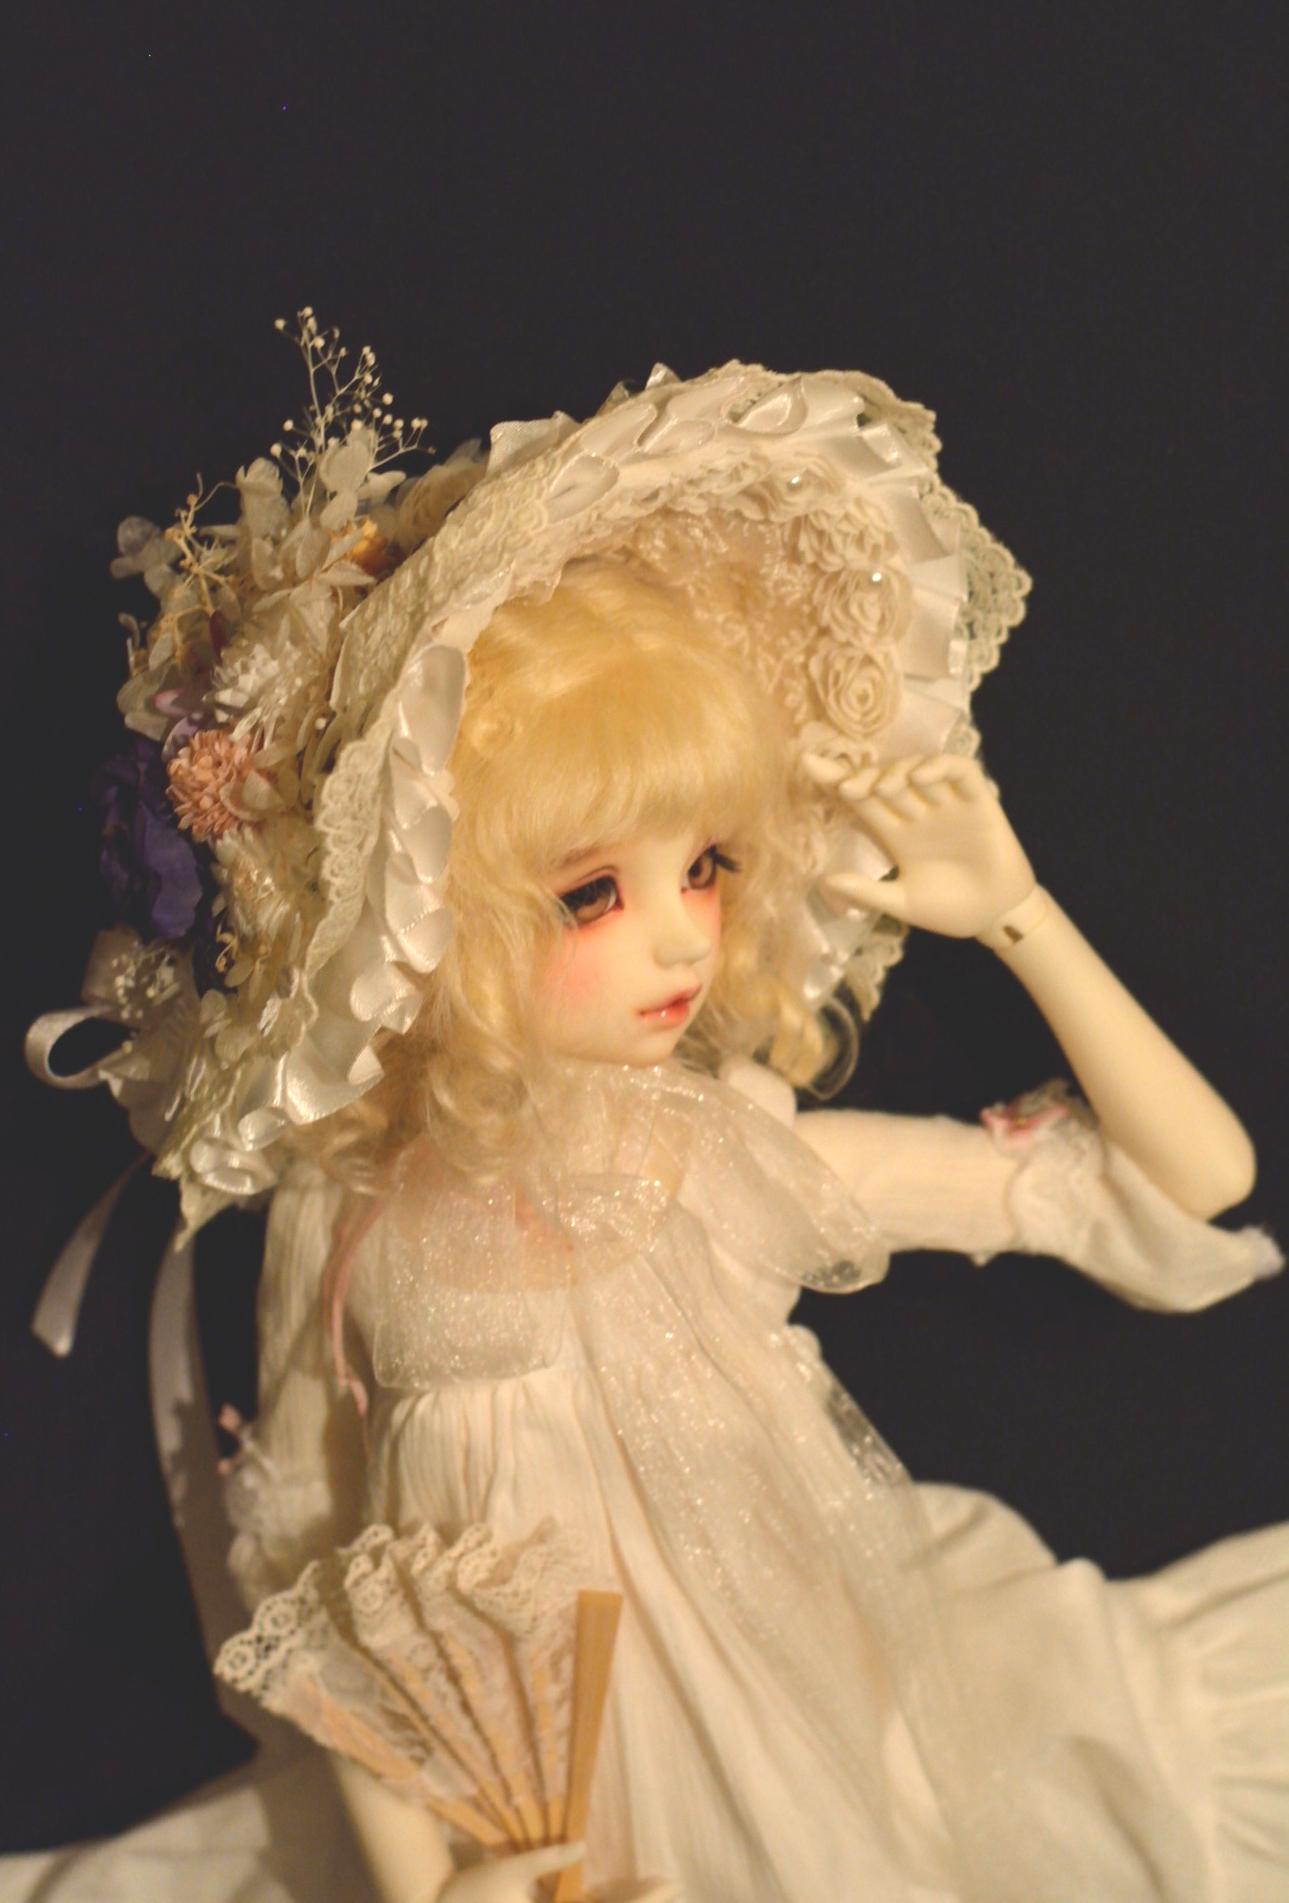 DSC_8055.jpg